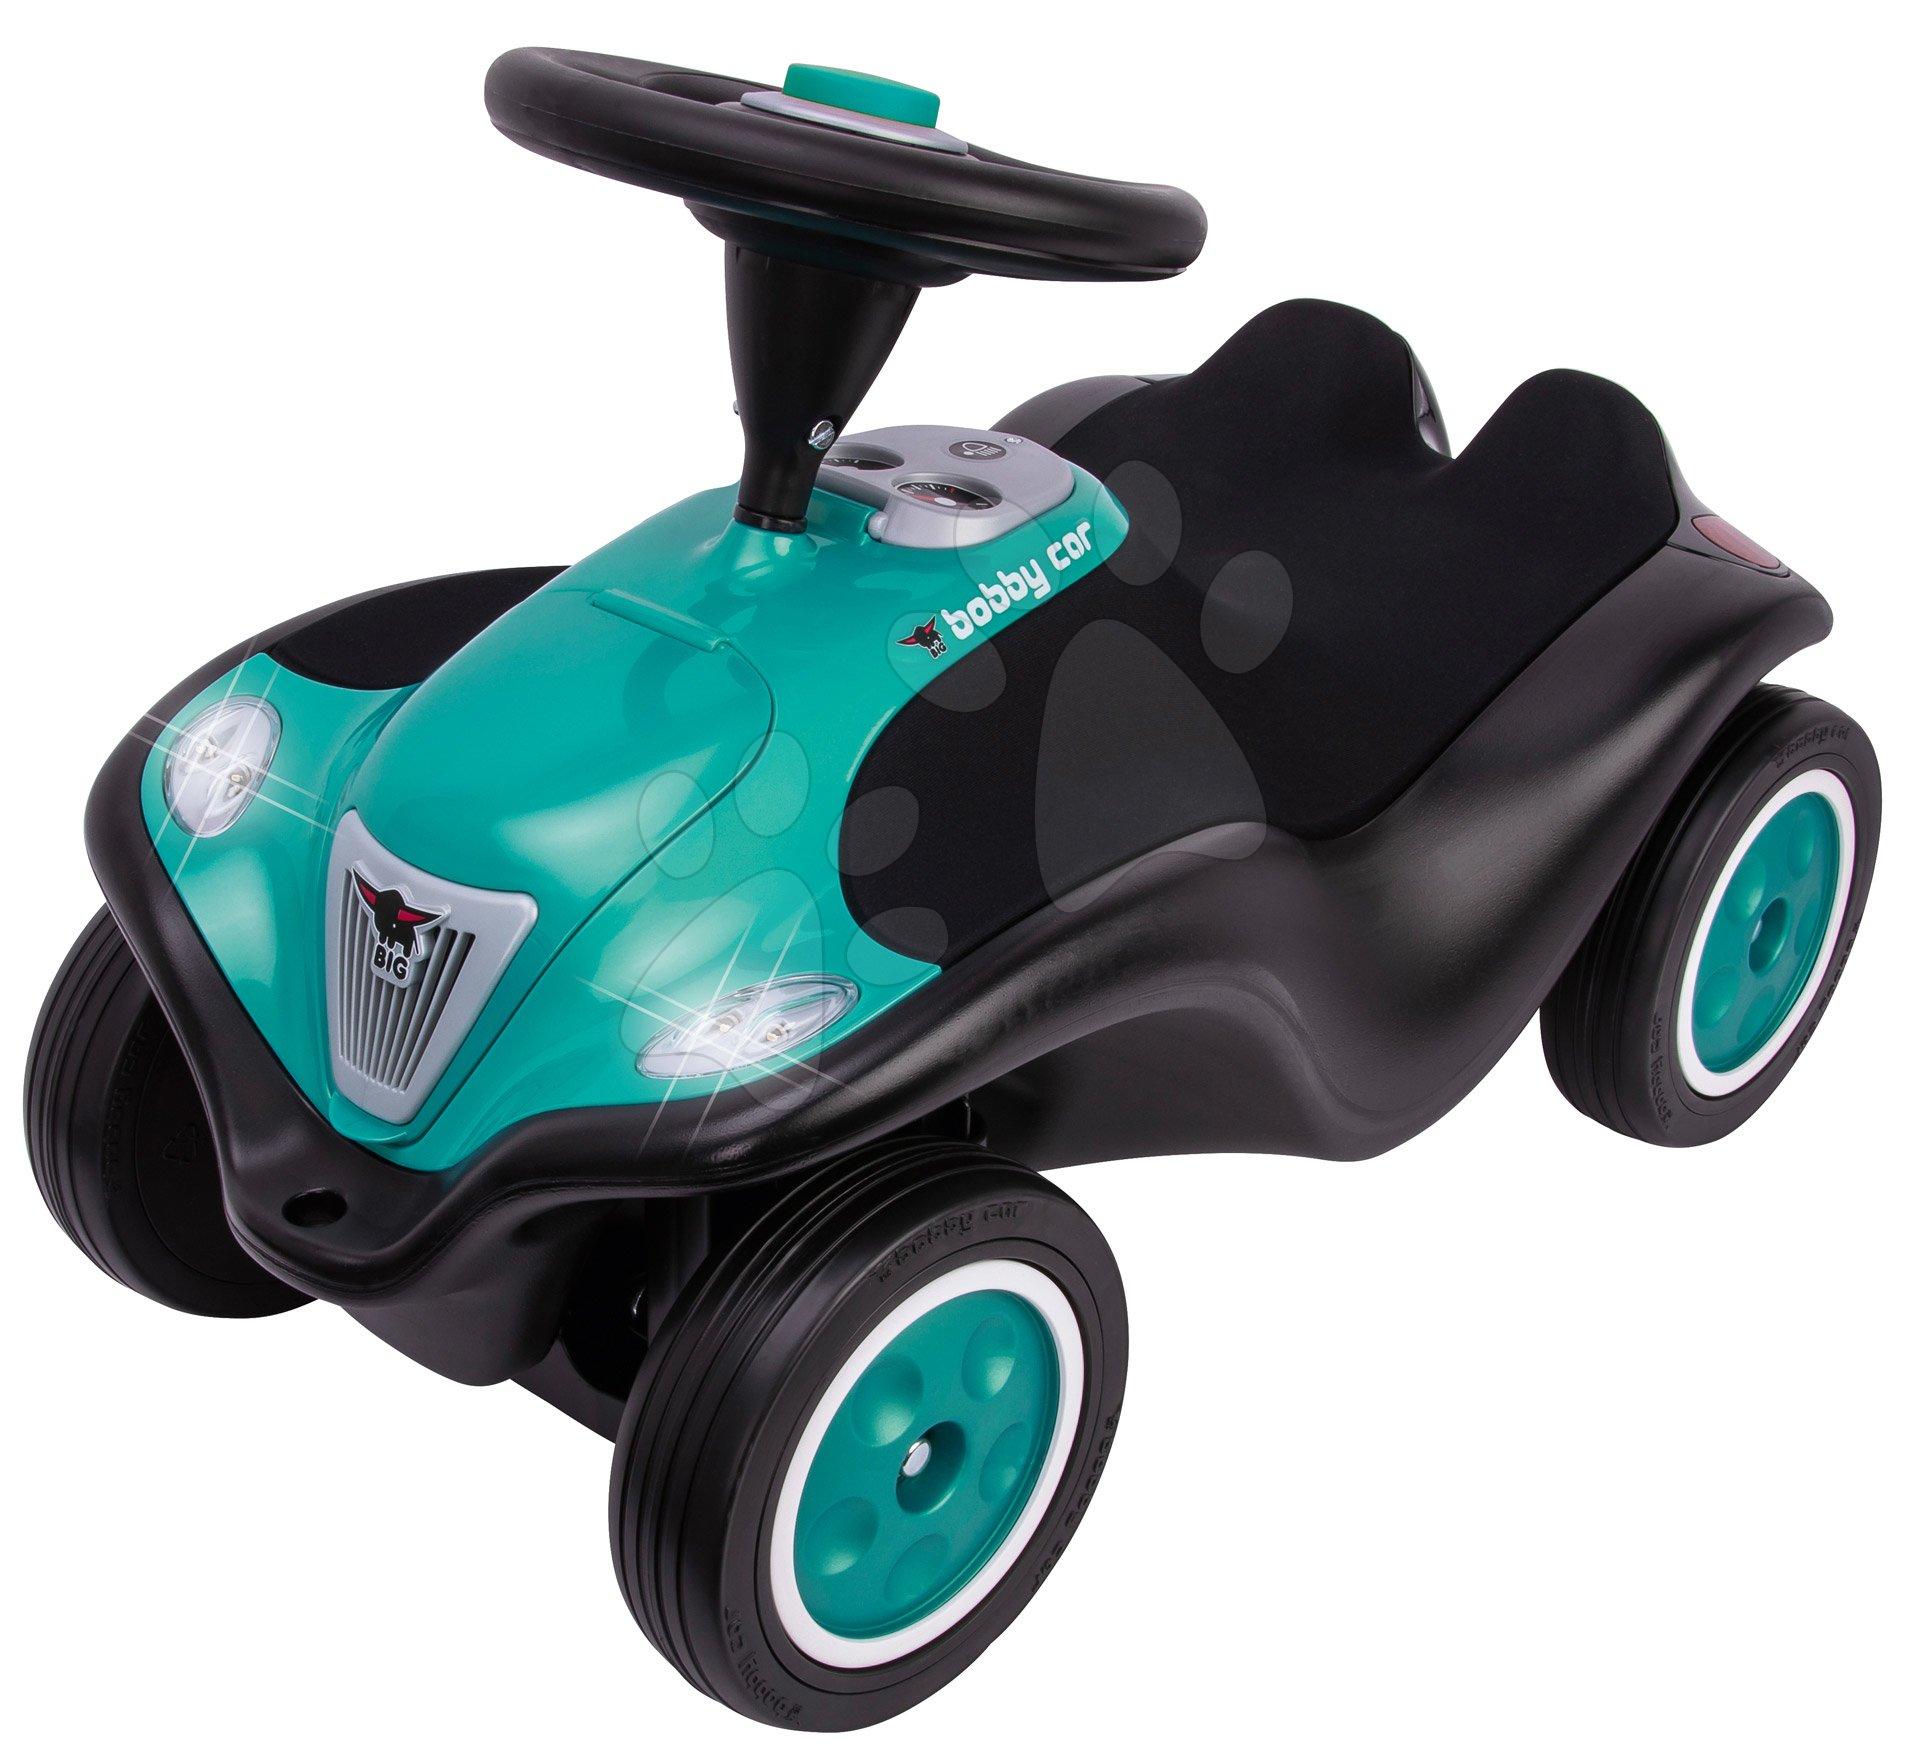 Babytaxiu Bobby Car Next Turquoise BIG faruri LED, claxon electronic, scaun ergonomic cu velur de la 12 luni